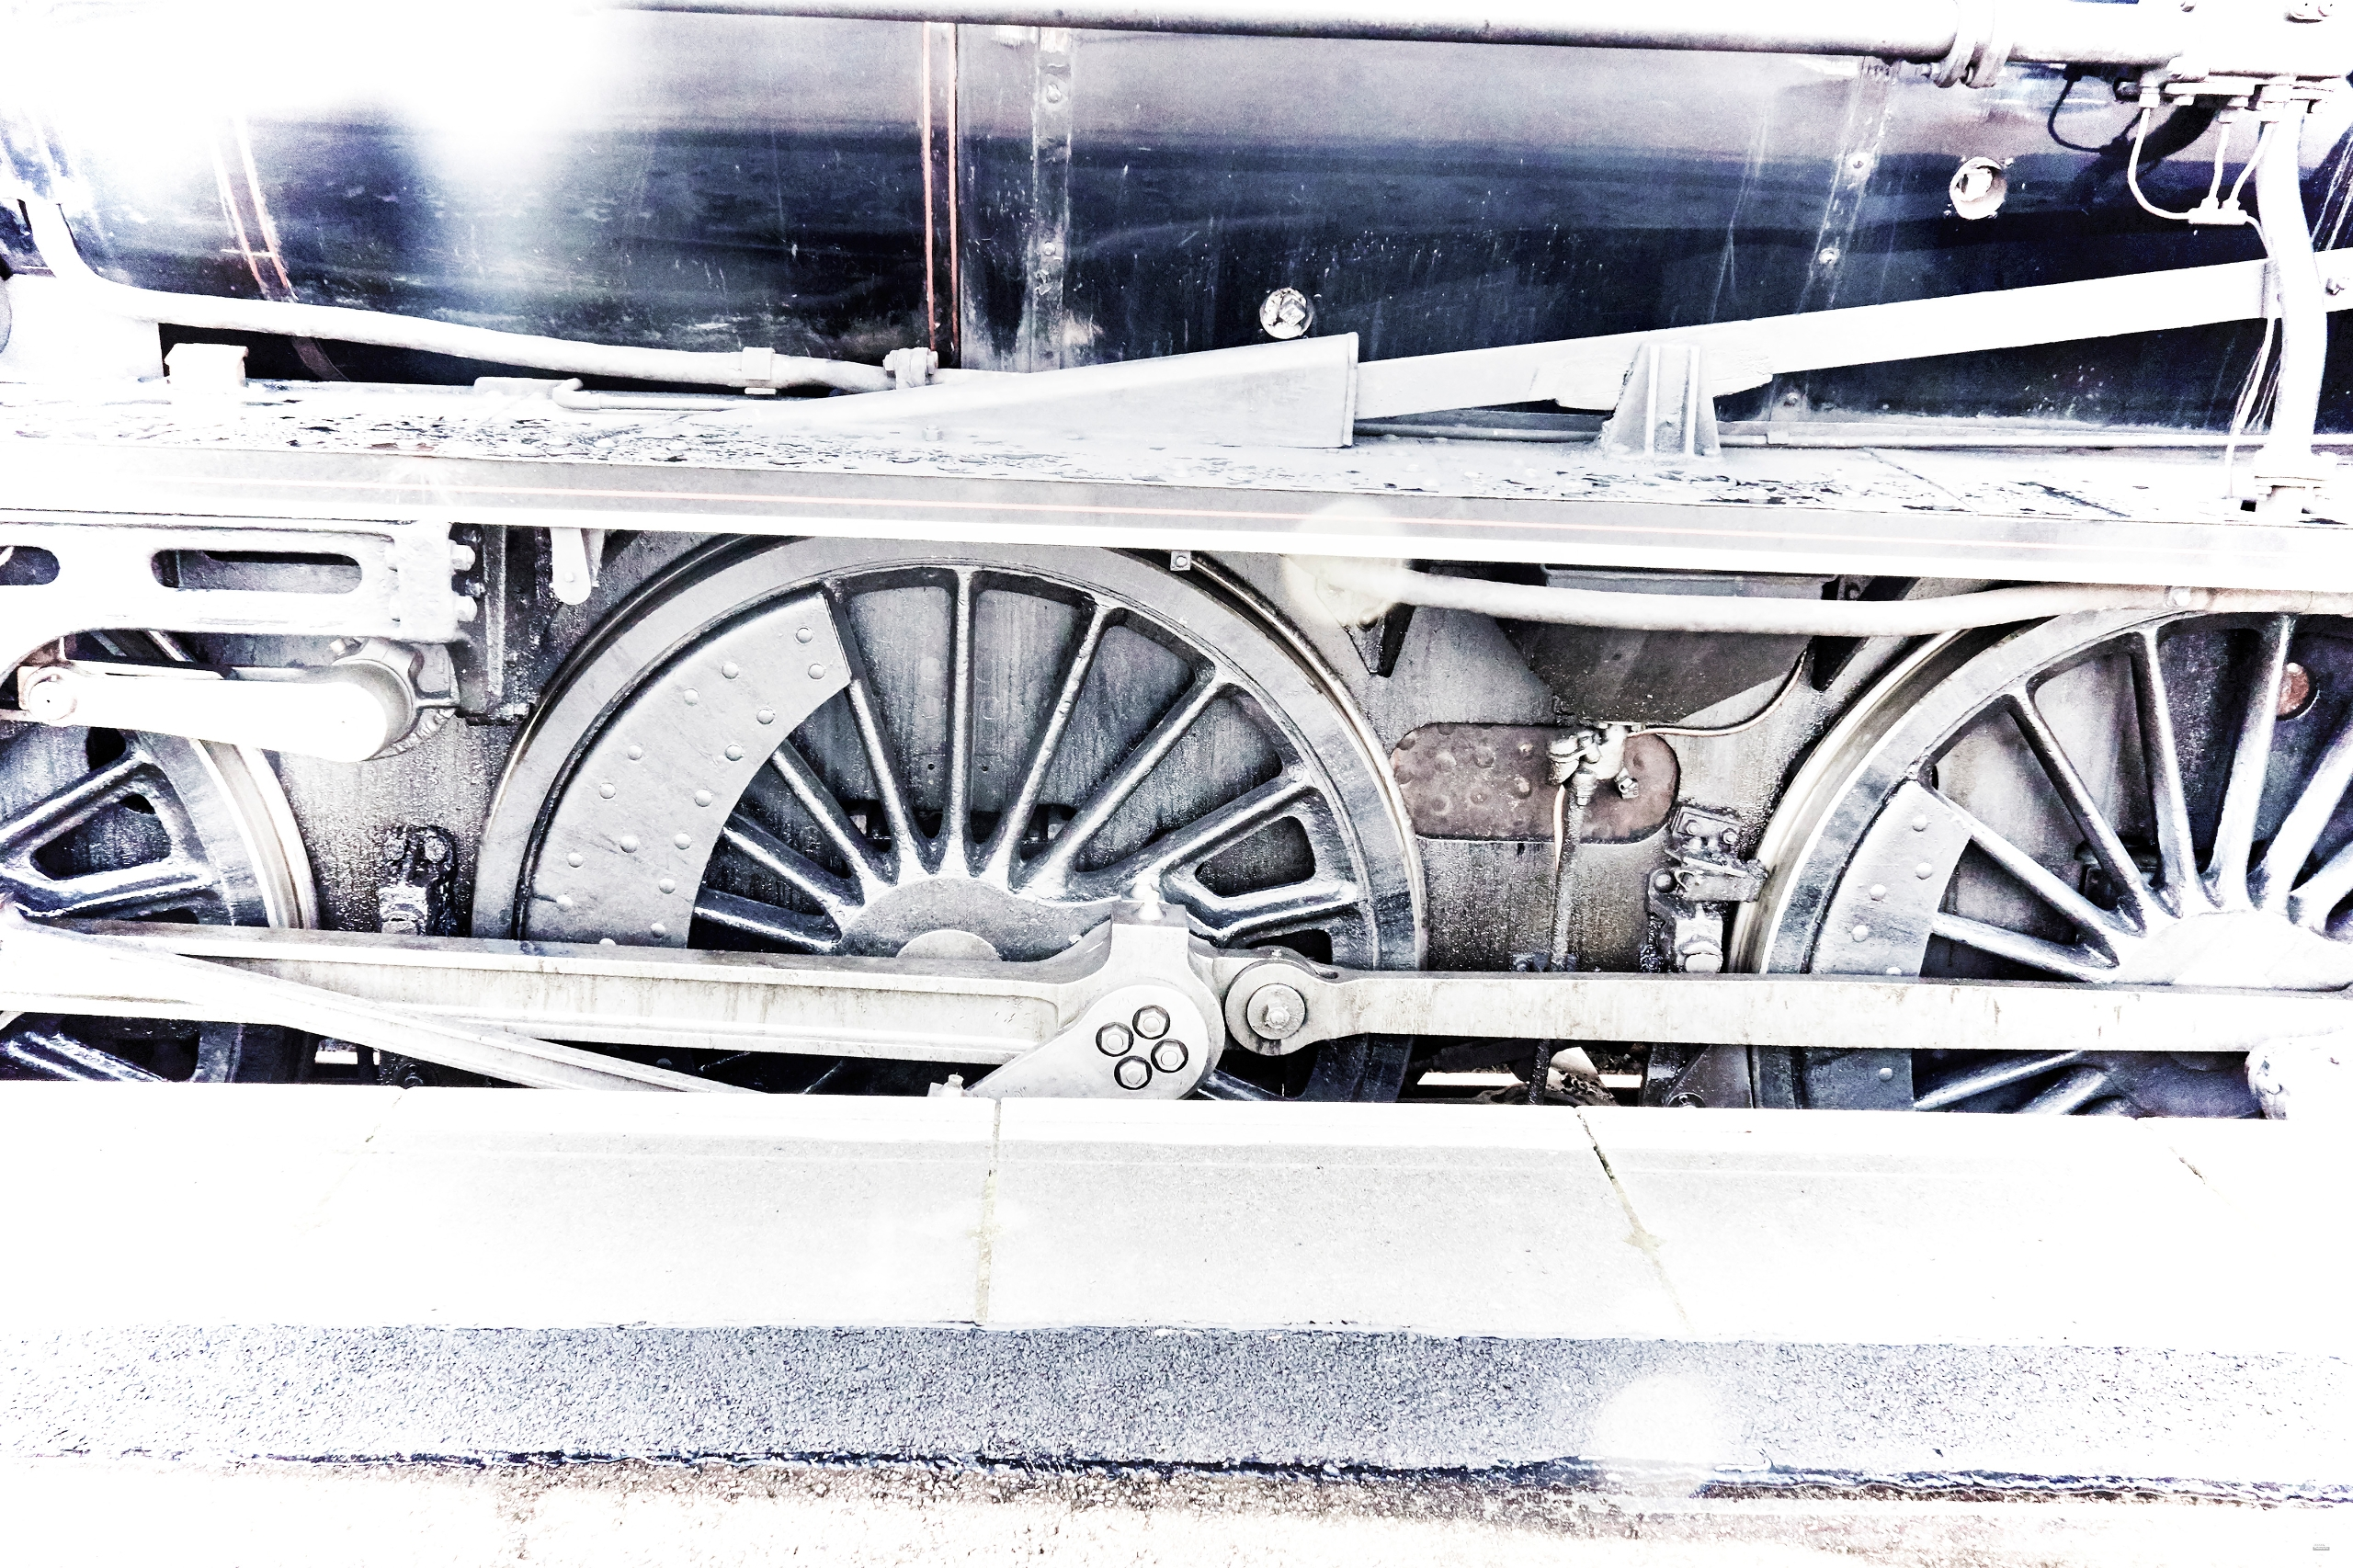 Steam Works III desaturated pho - ageekonabike   ello